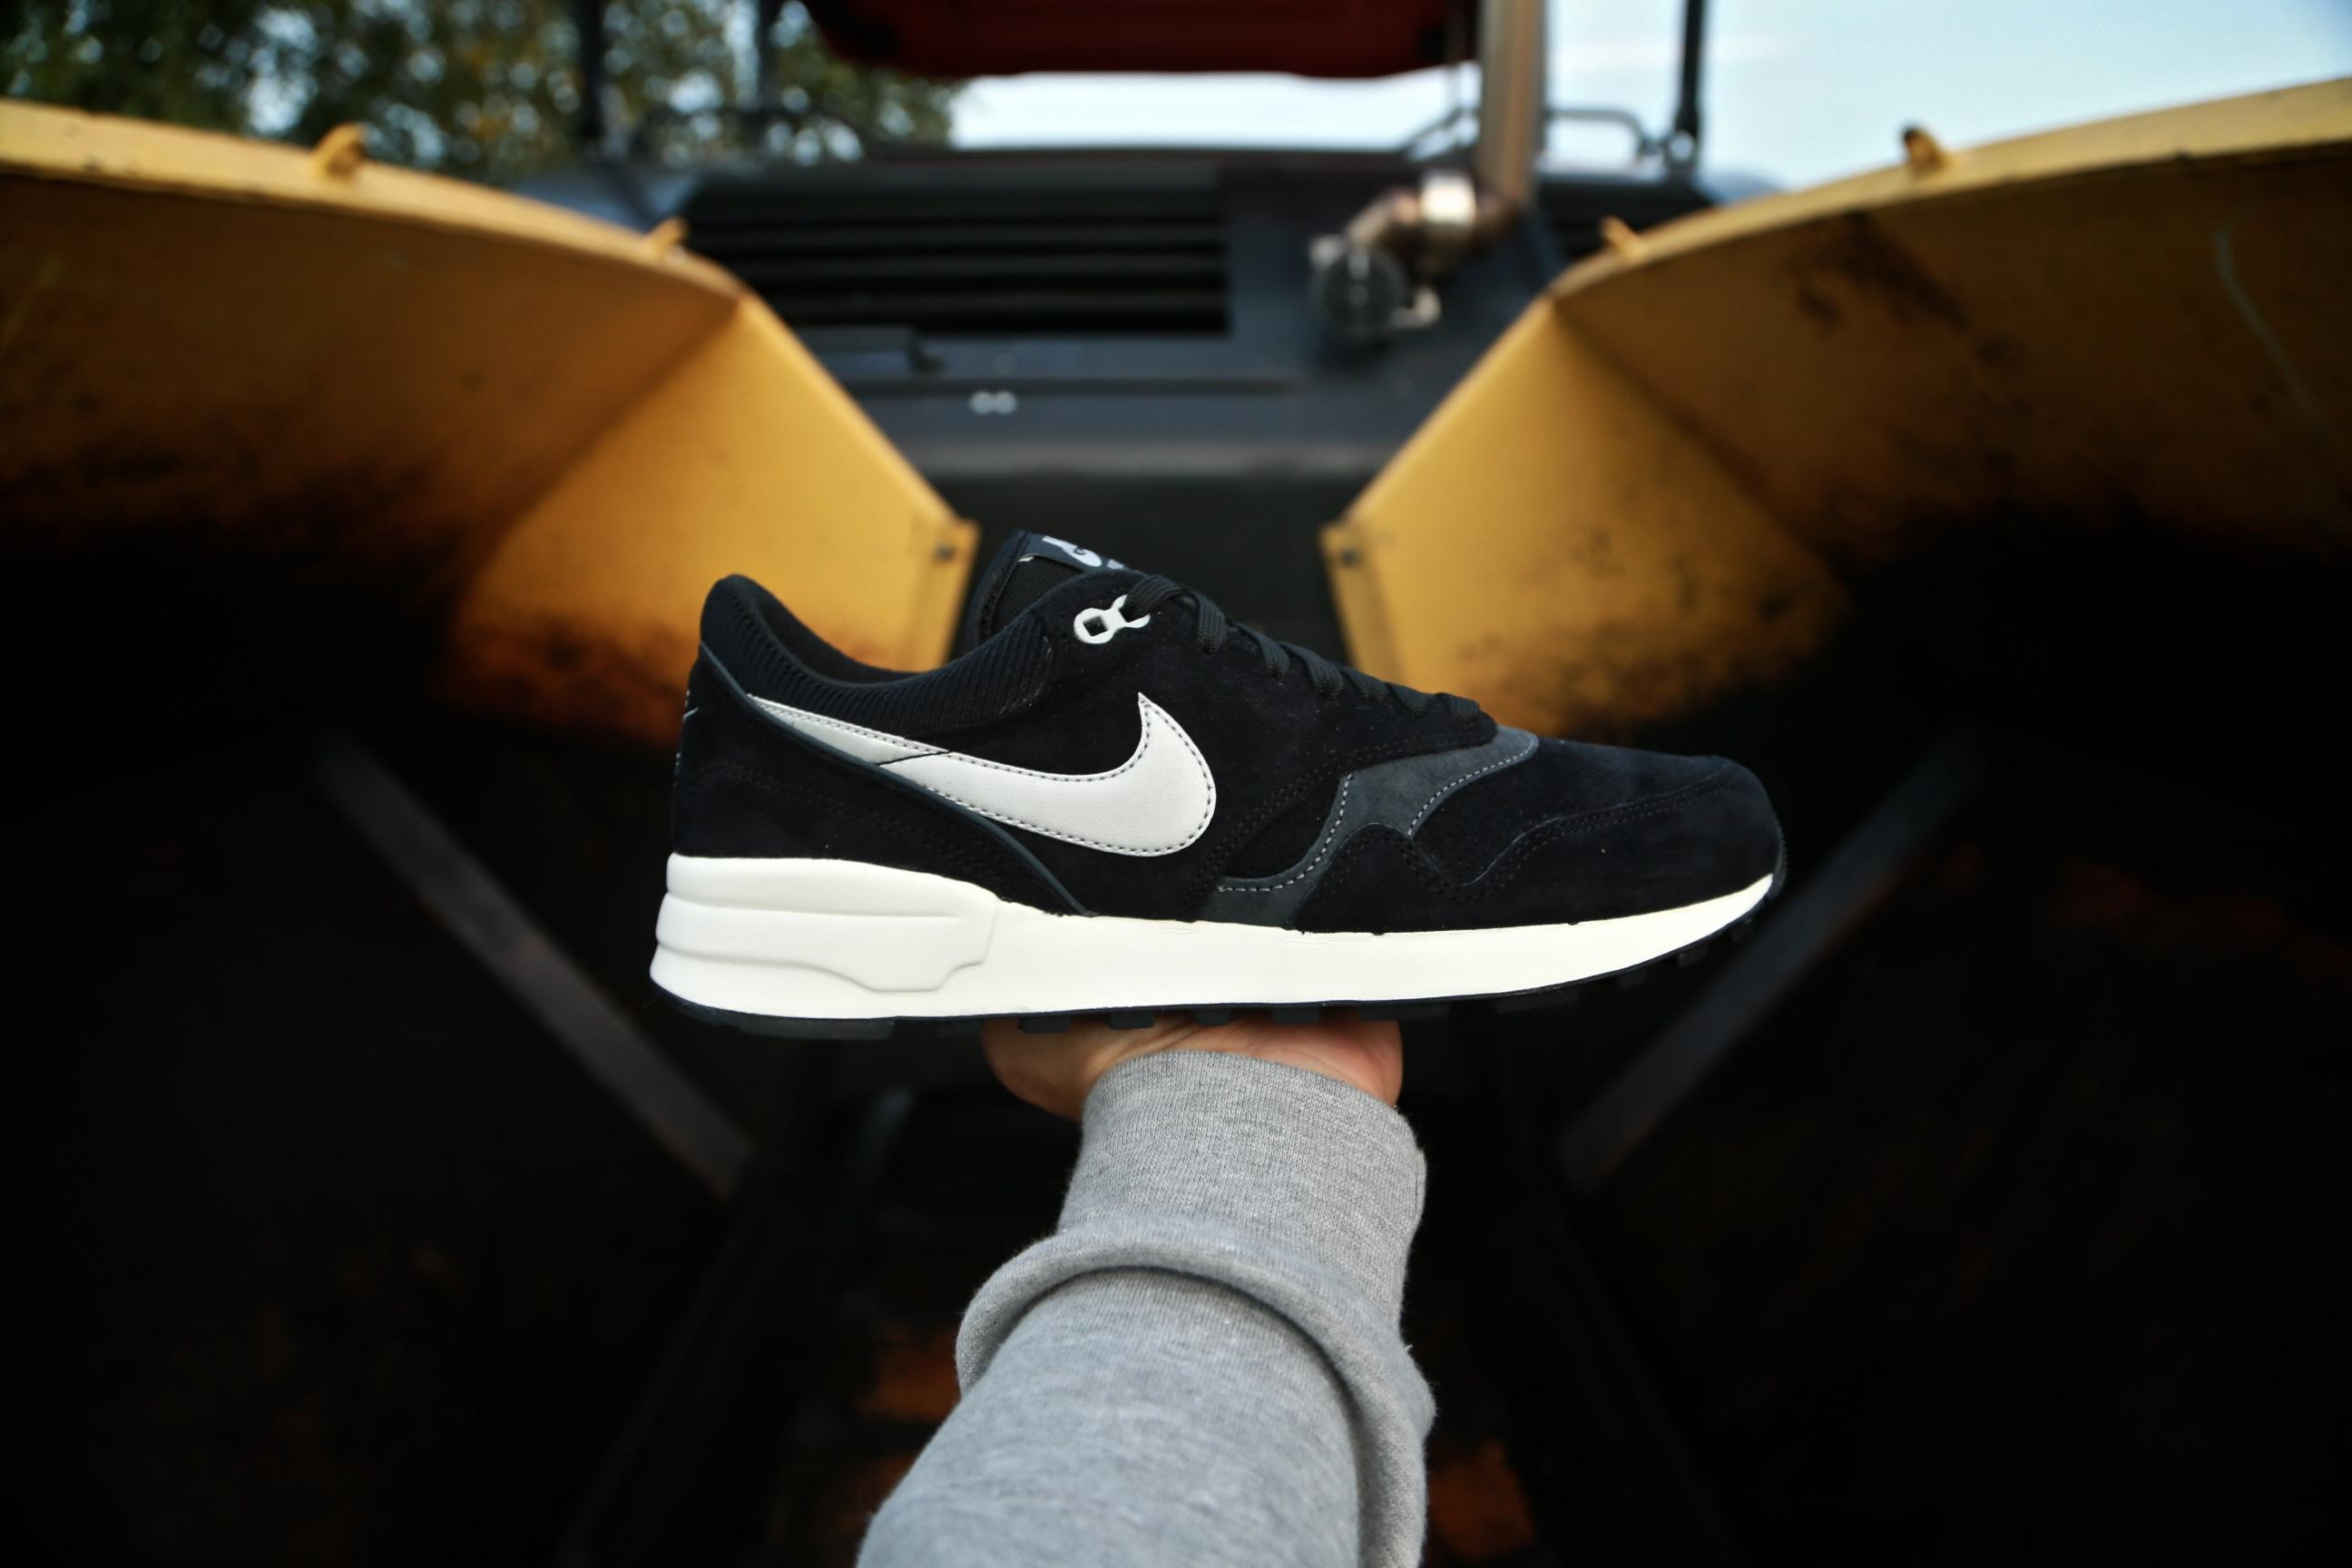 e48dd821d4c Nike Air Odyssey LTR – Black   Anthracite   Sail   Night Silver – STASP